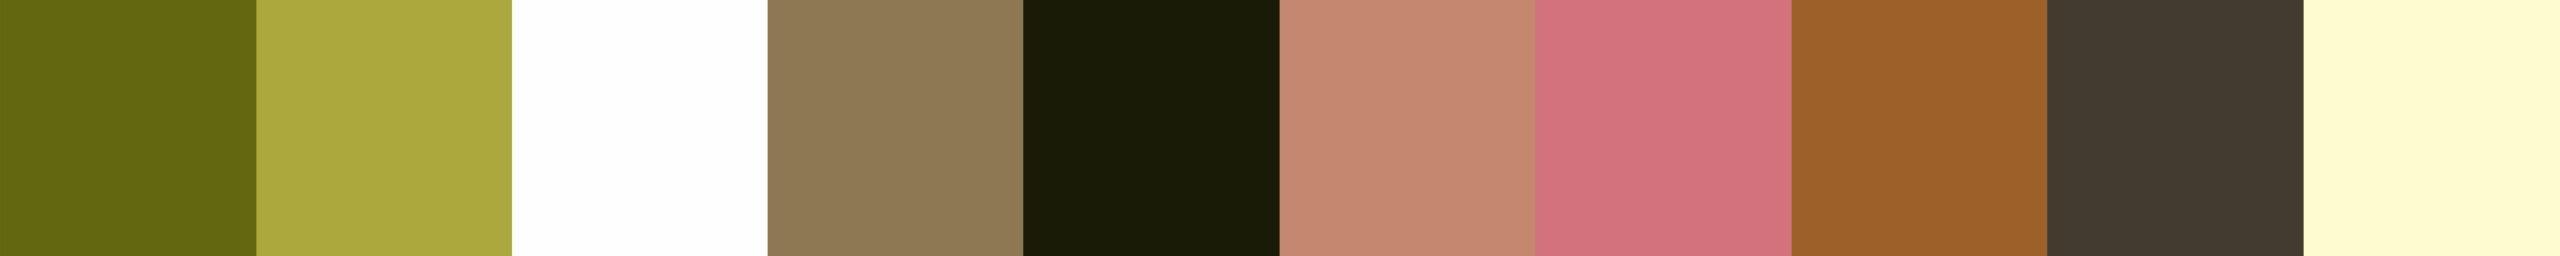 155 Kiebaco Color Palette